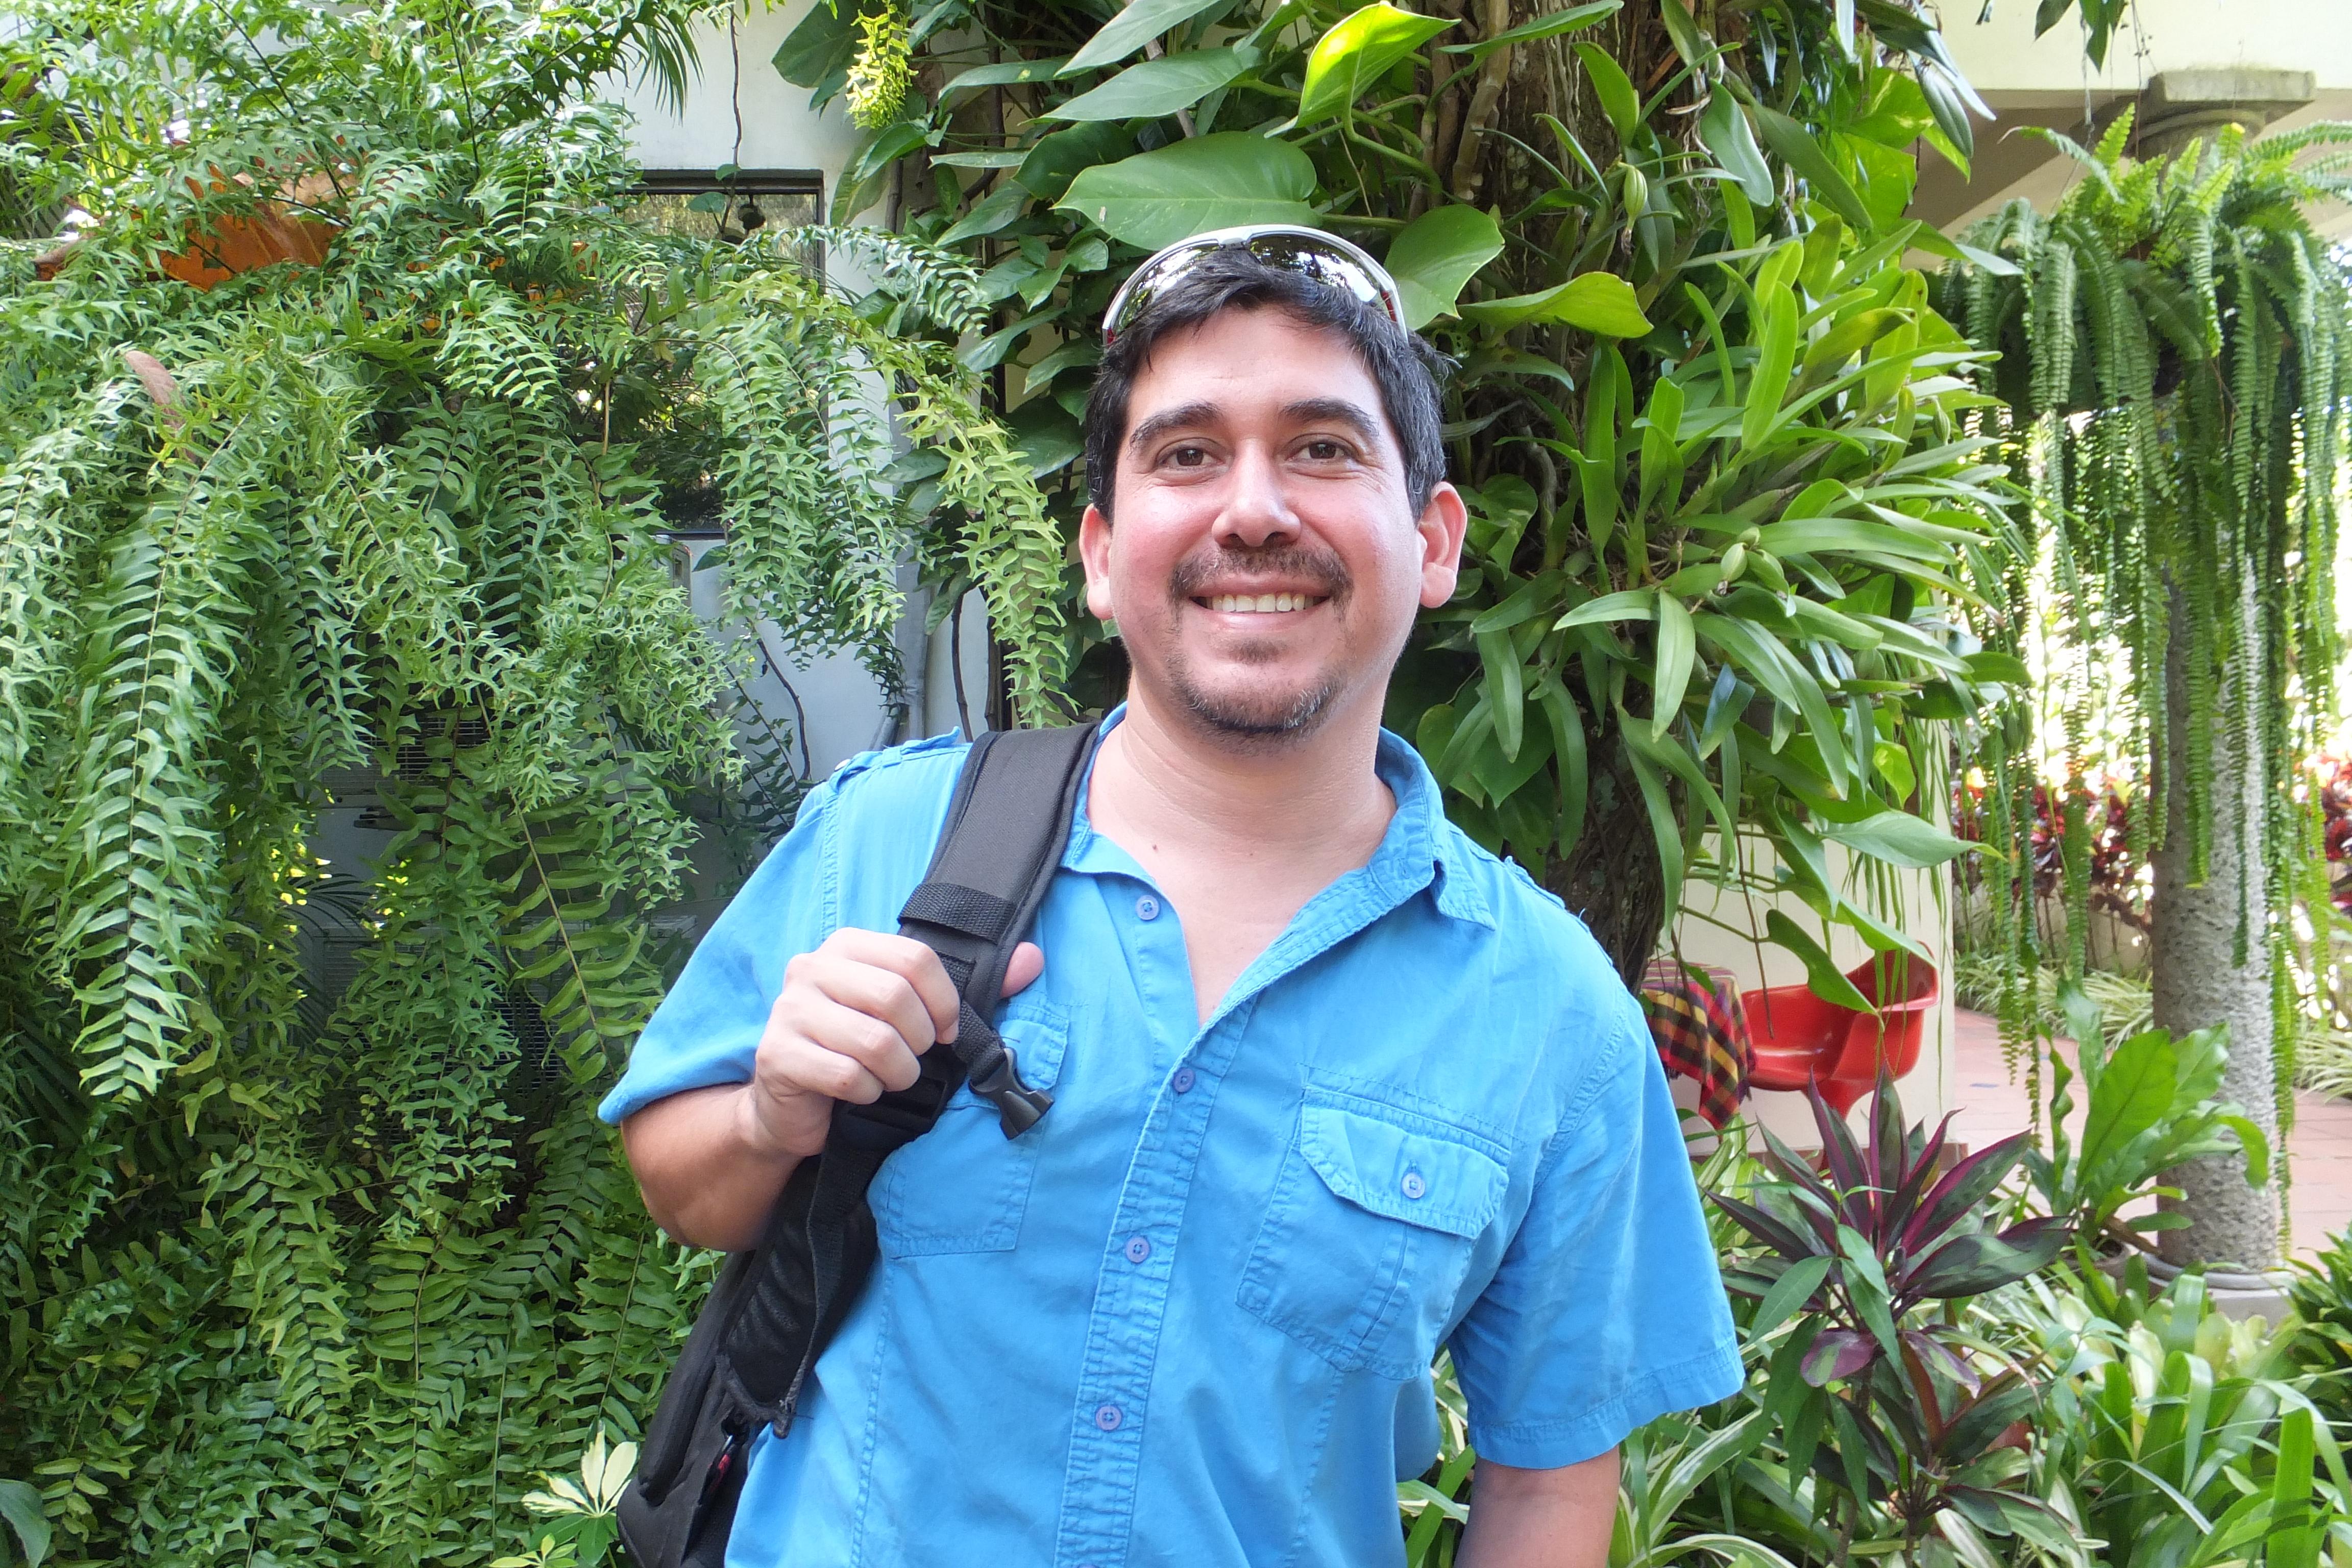 Raul Martinez Life Experiences Salvador